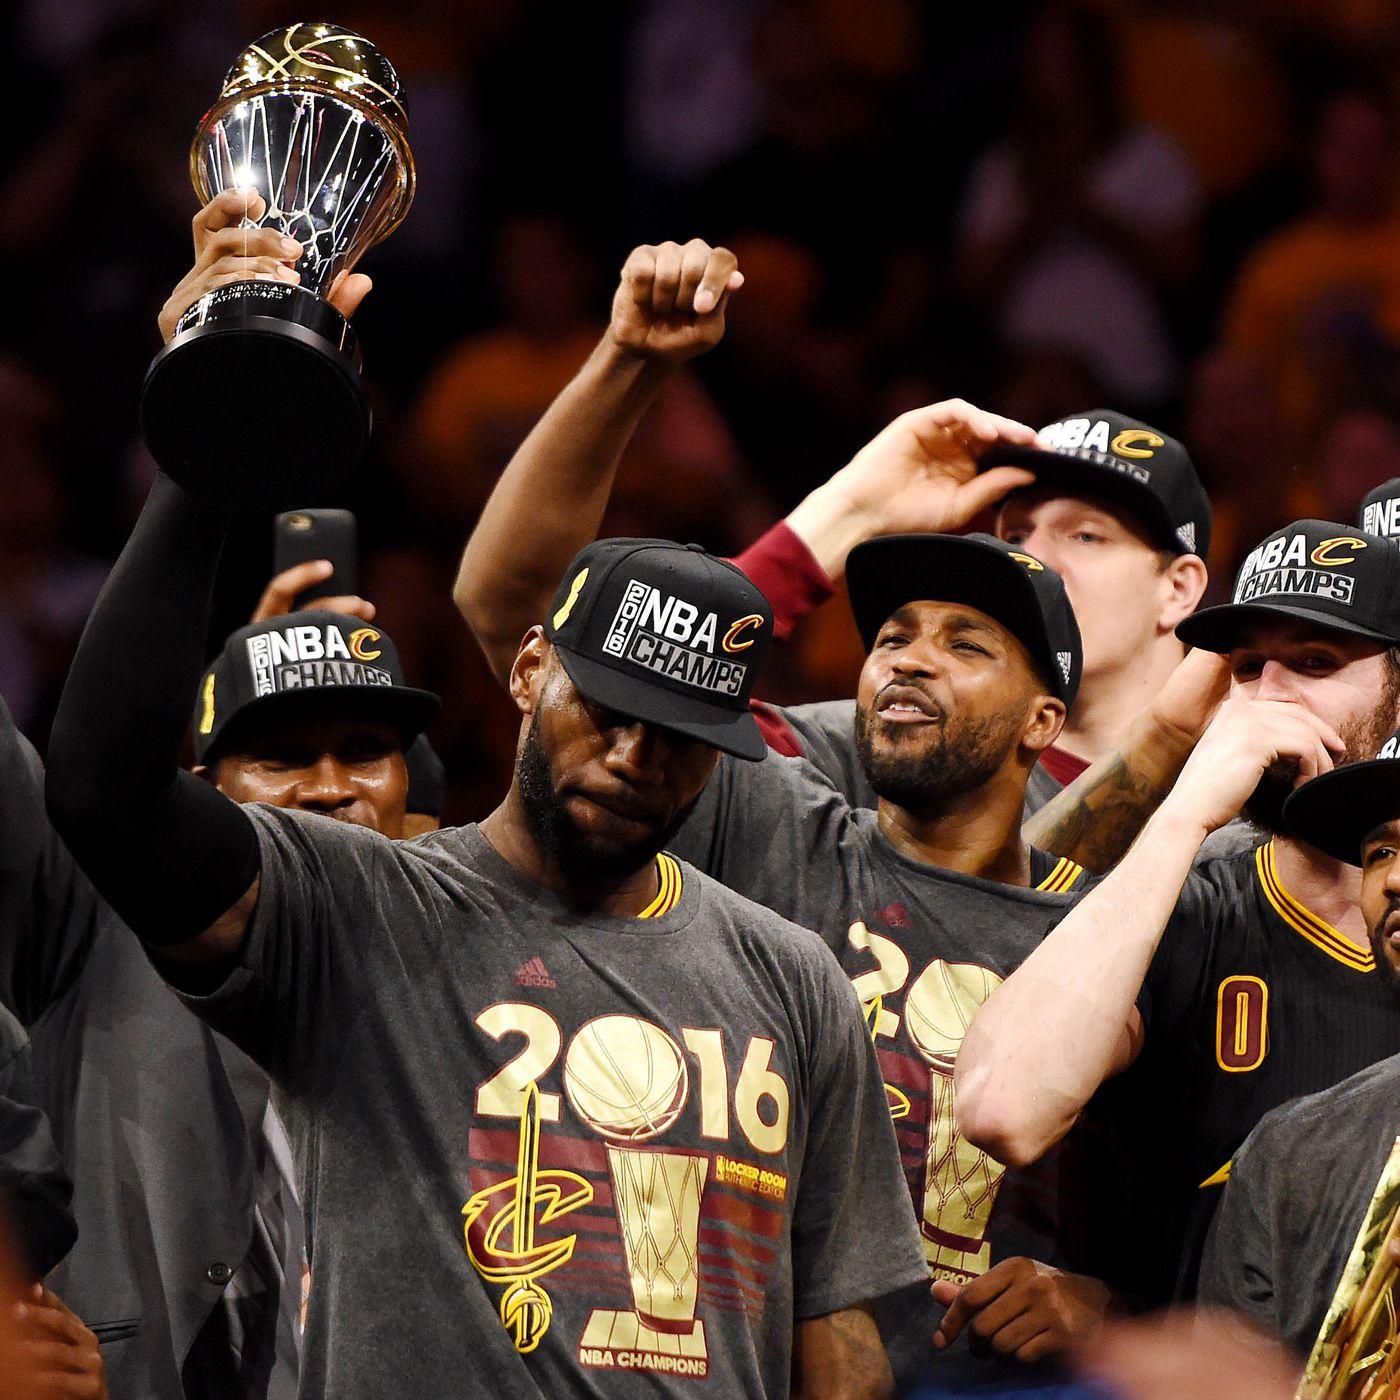 ef1d4e503fdf LeBron James is the obvious 2016 NBA Finals MVP winner - SBNation.com